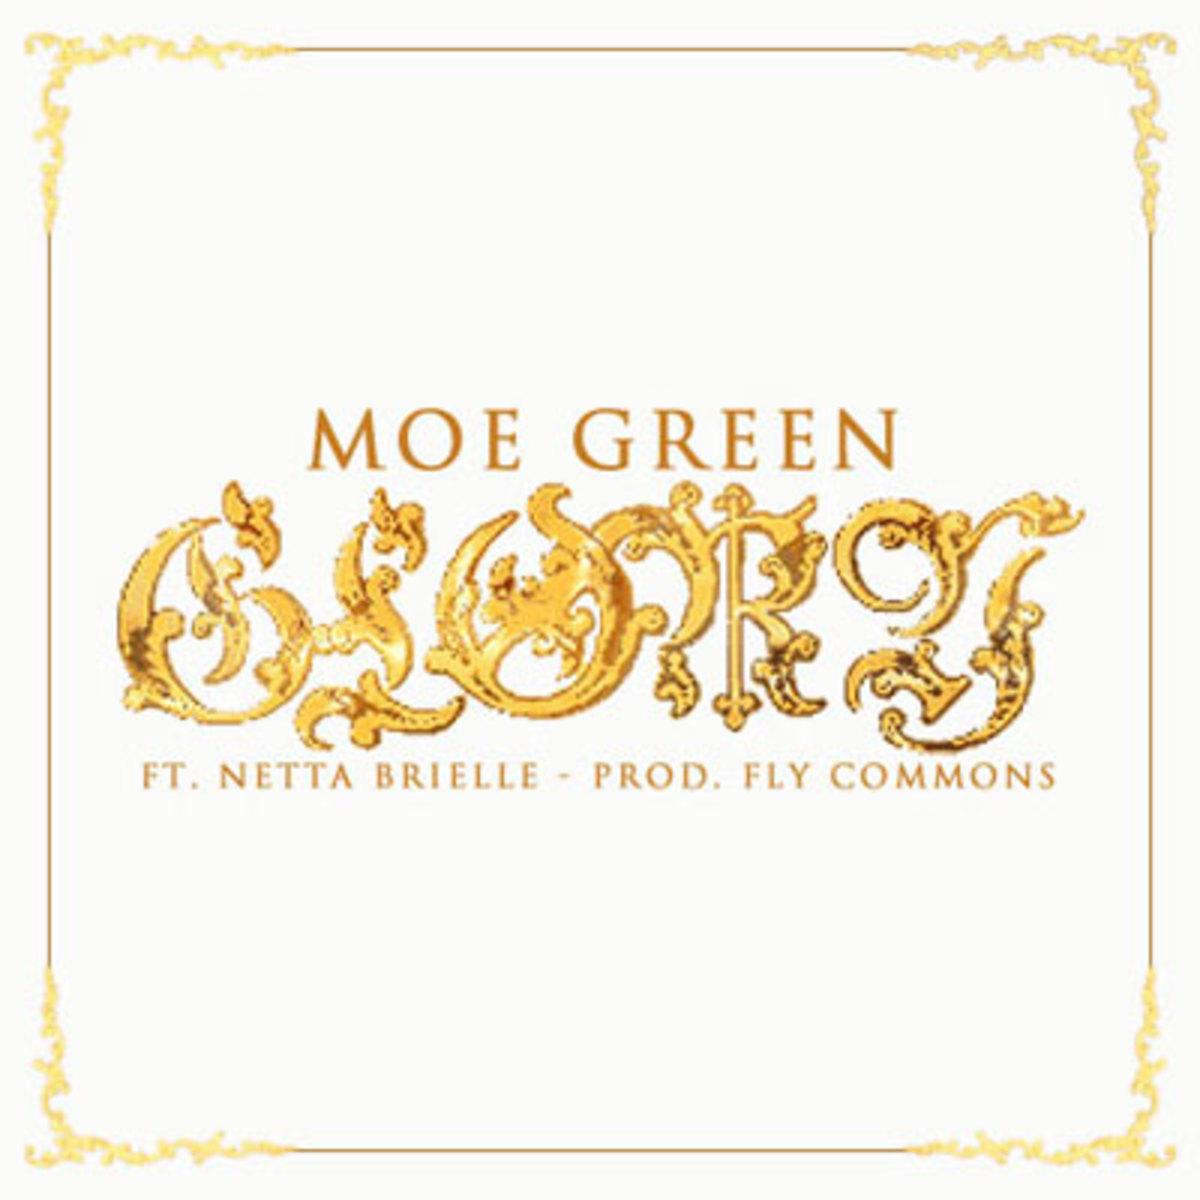 moegreen-glory.jpg